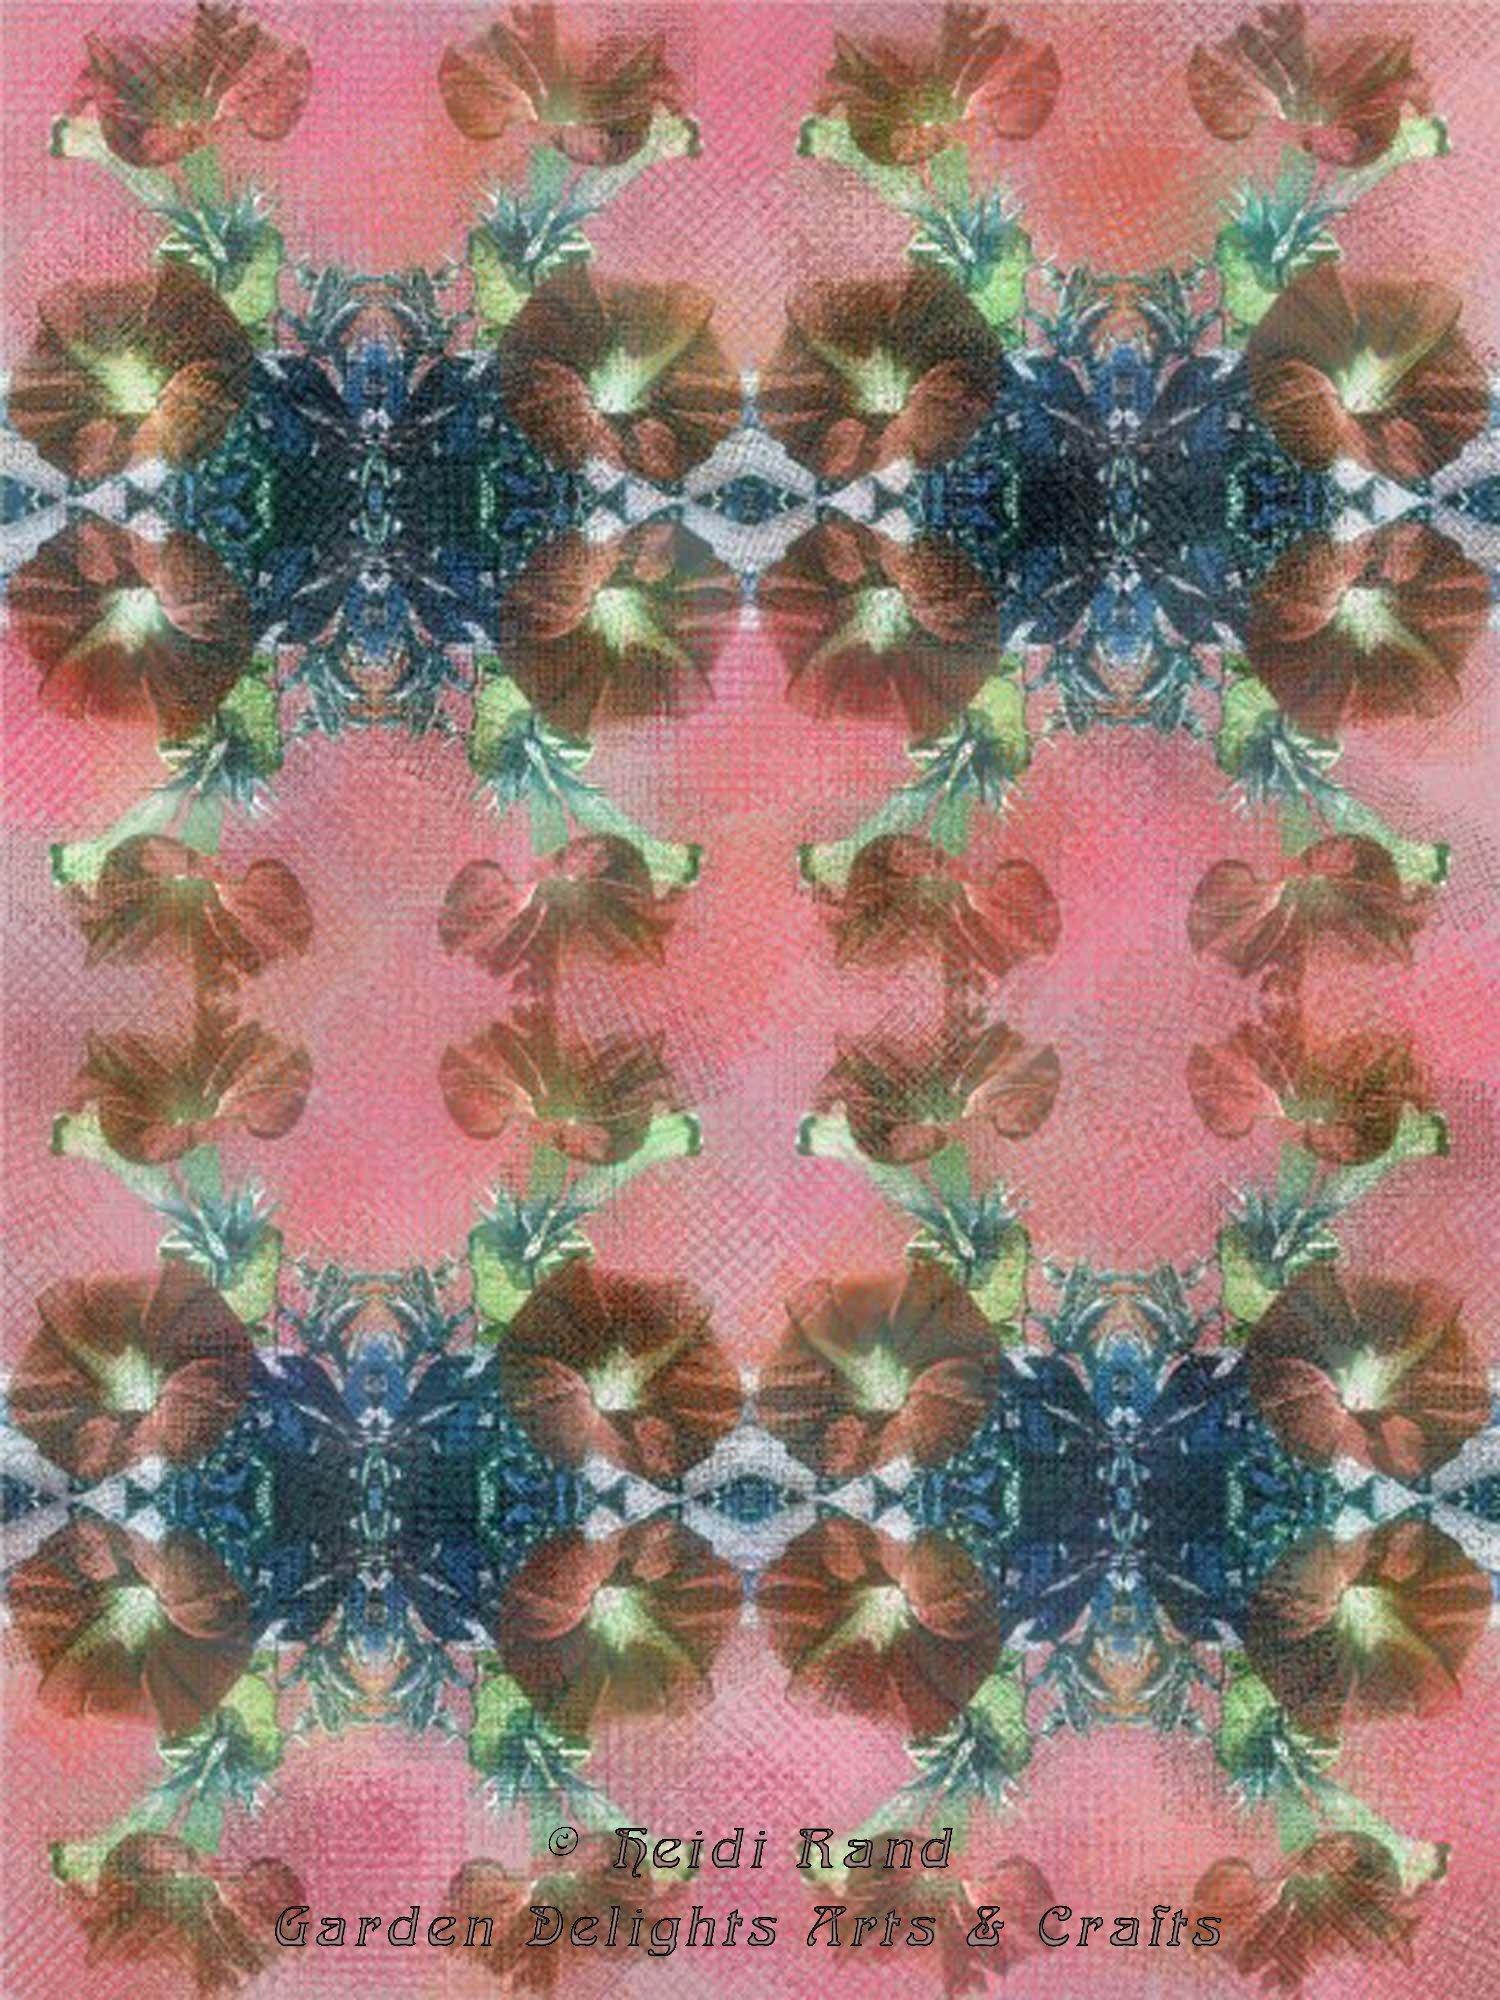 Morning glory kaleidoscope